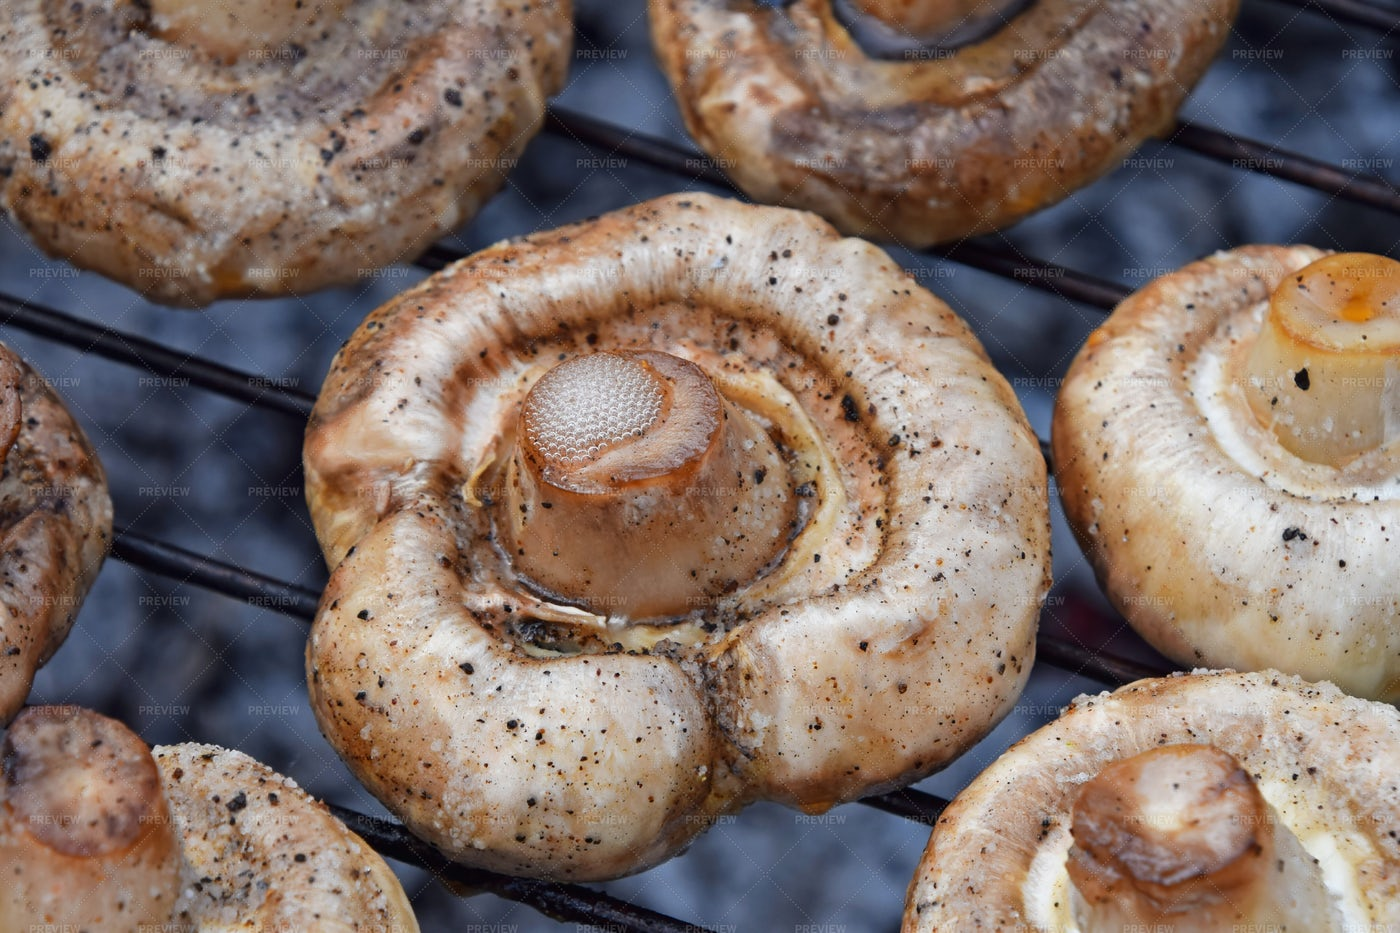 Grilling Mushrooms: Stock Photos